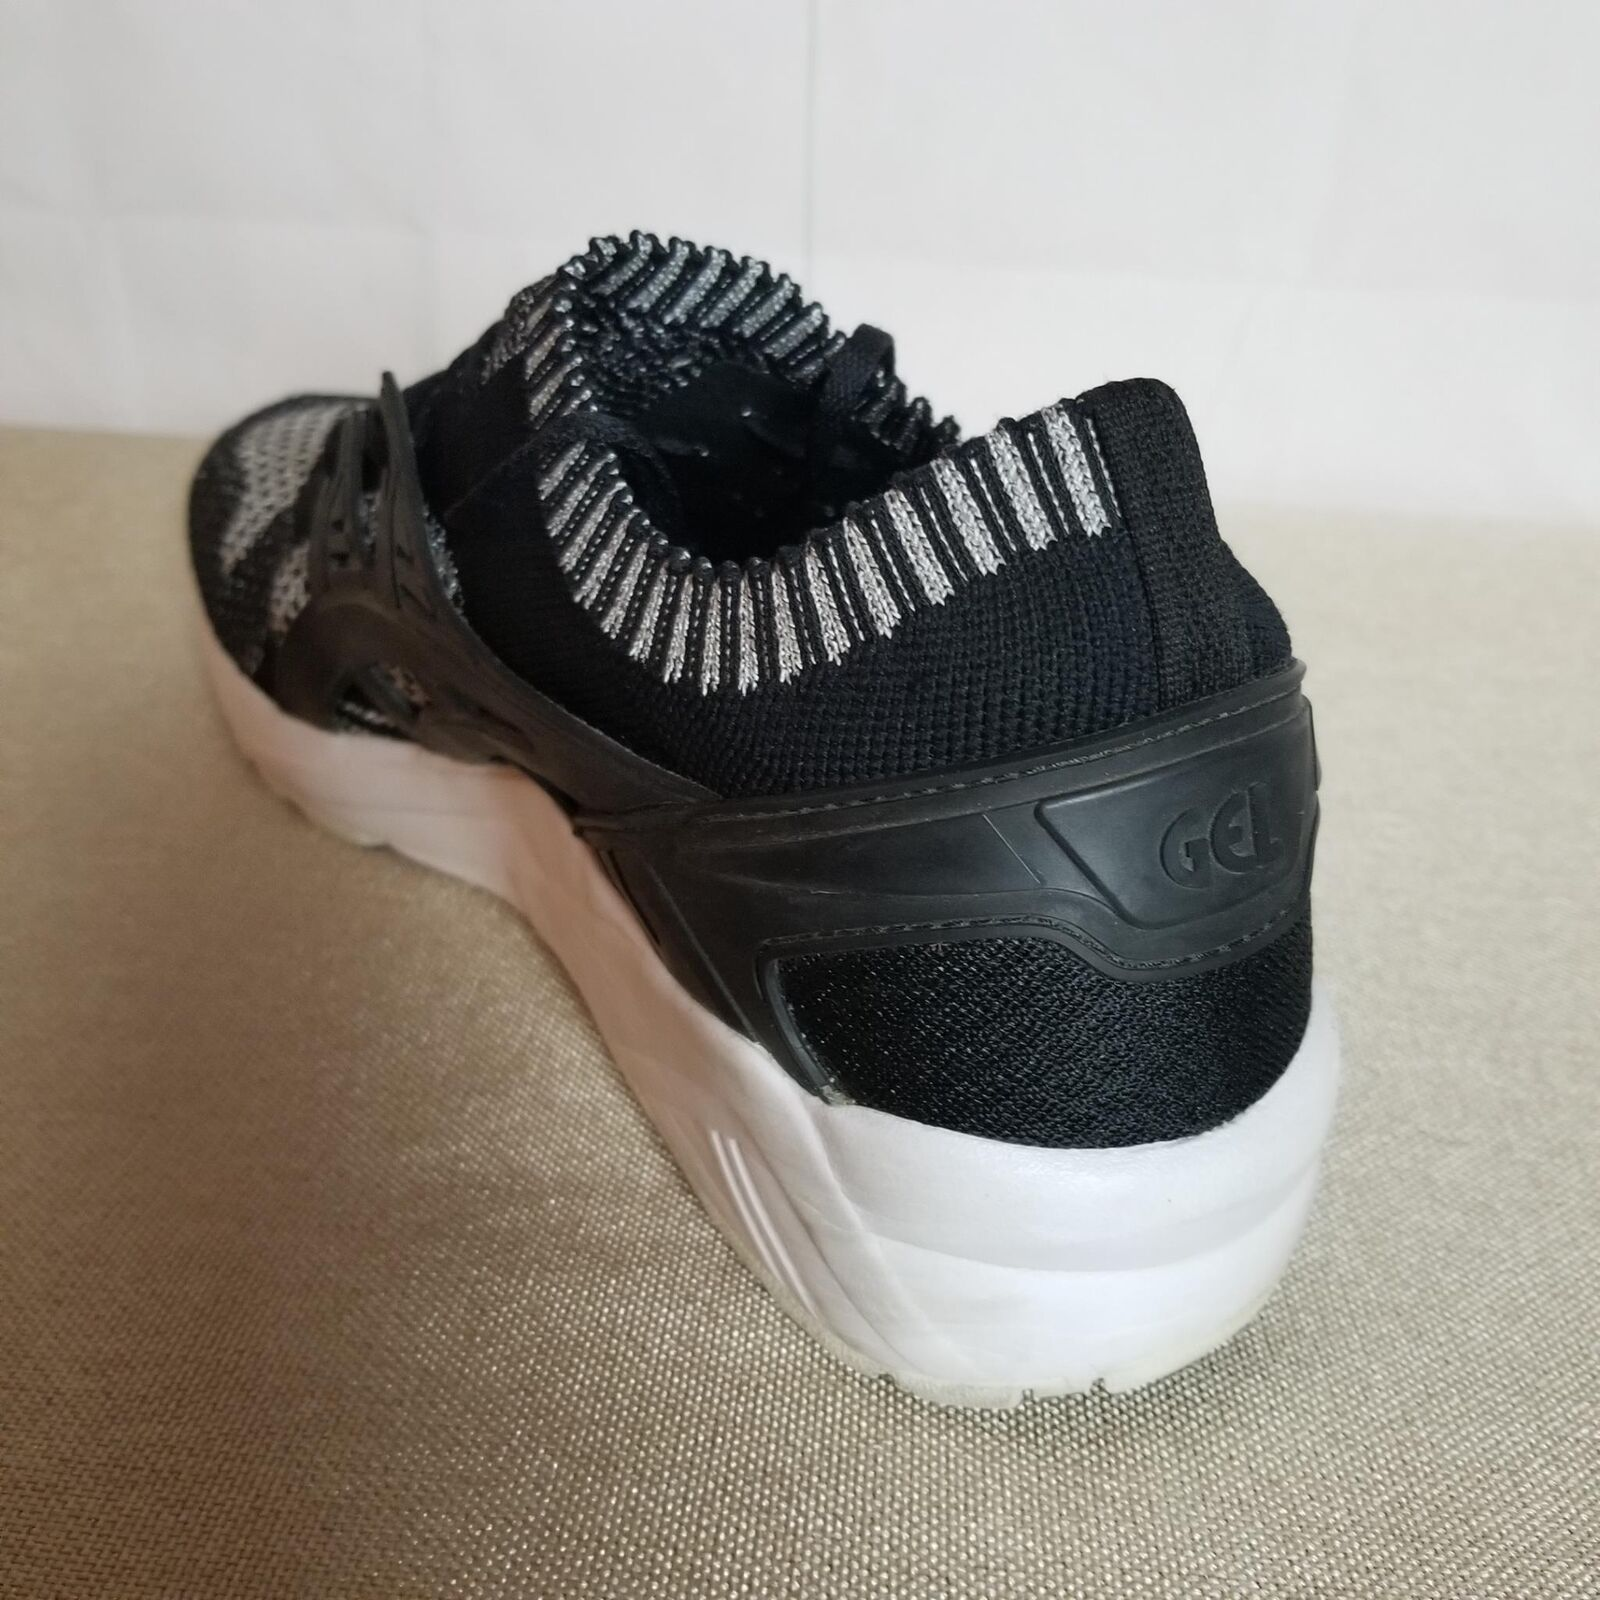 Asics Asics Asics Men's Gel-Kayano Trainers shoes Size 12M Athleti Knit Silver Black 344fed